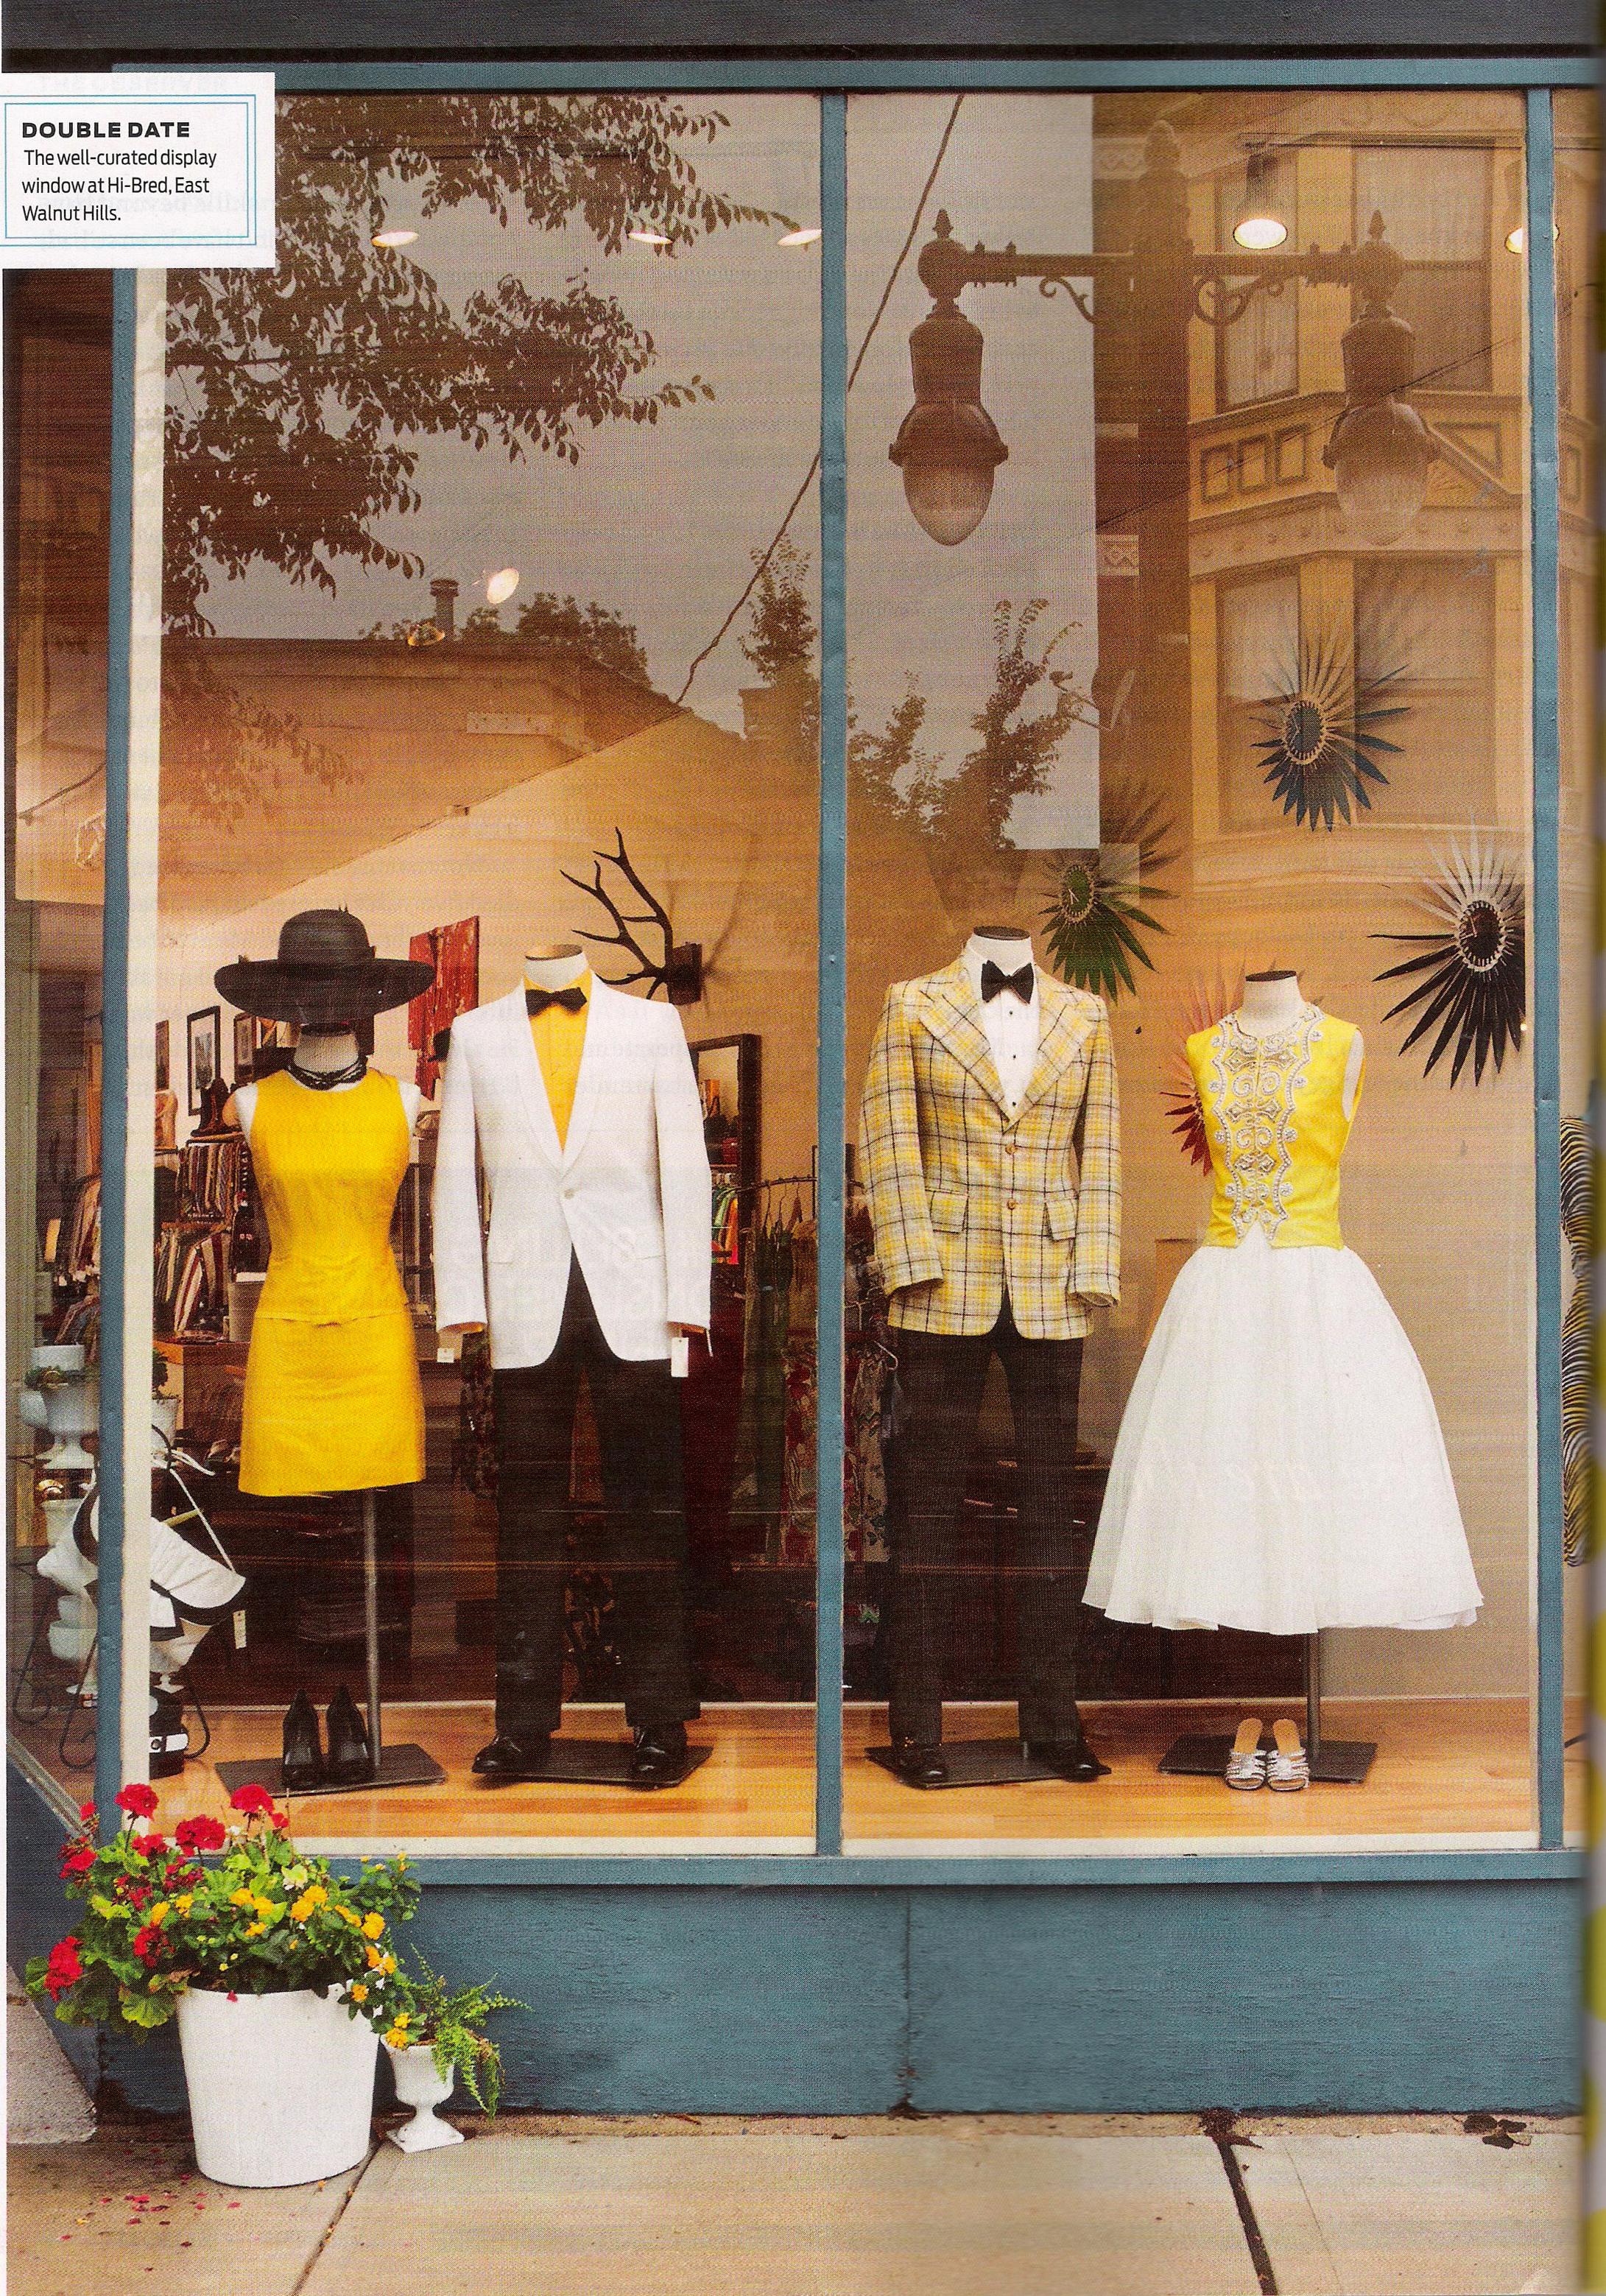 2013 September edition Cincinnati Magazine Best little shops